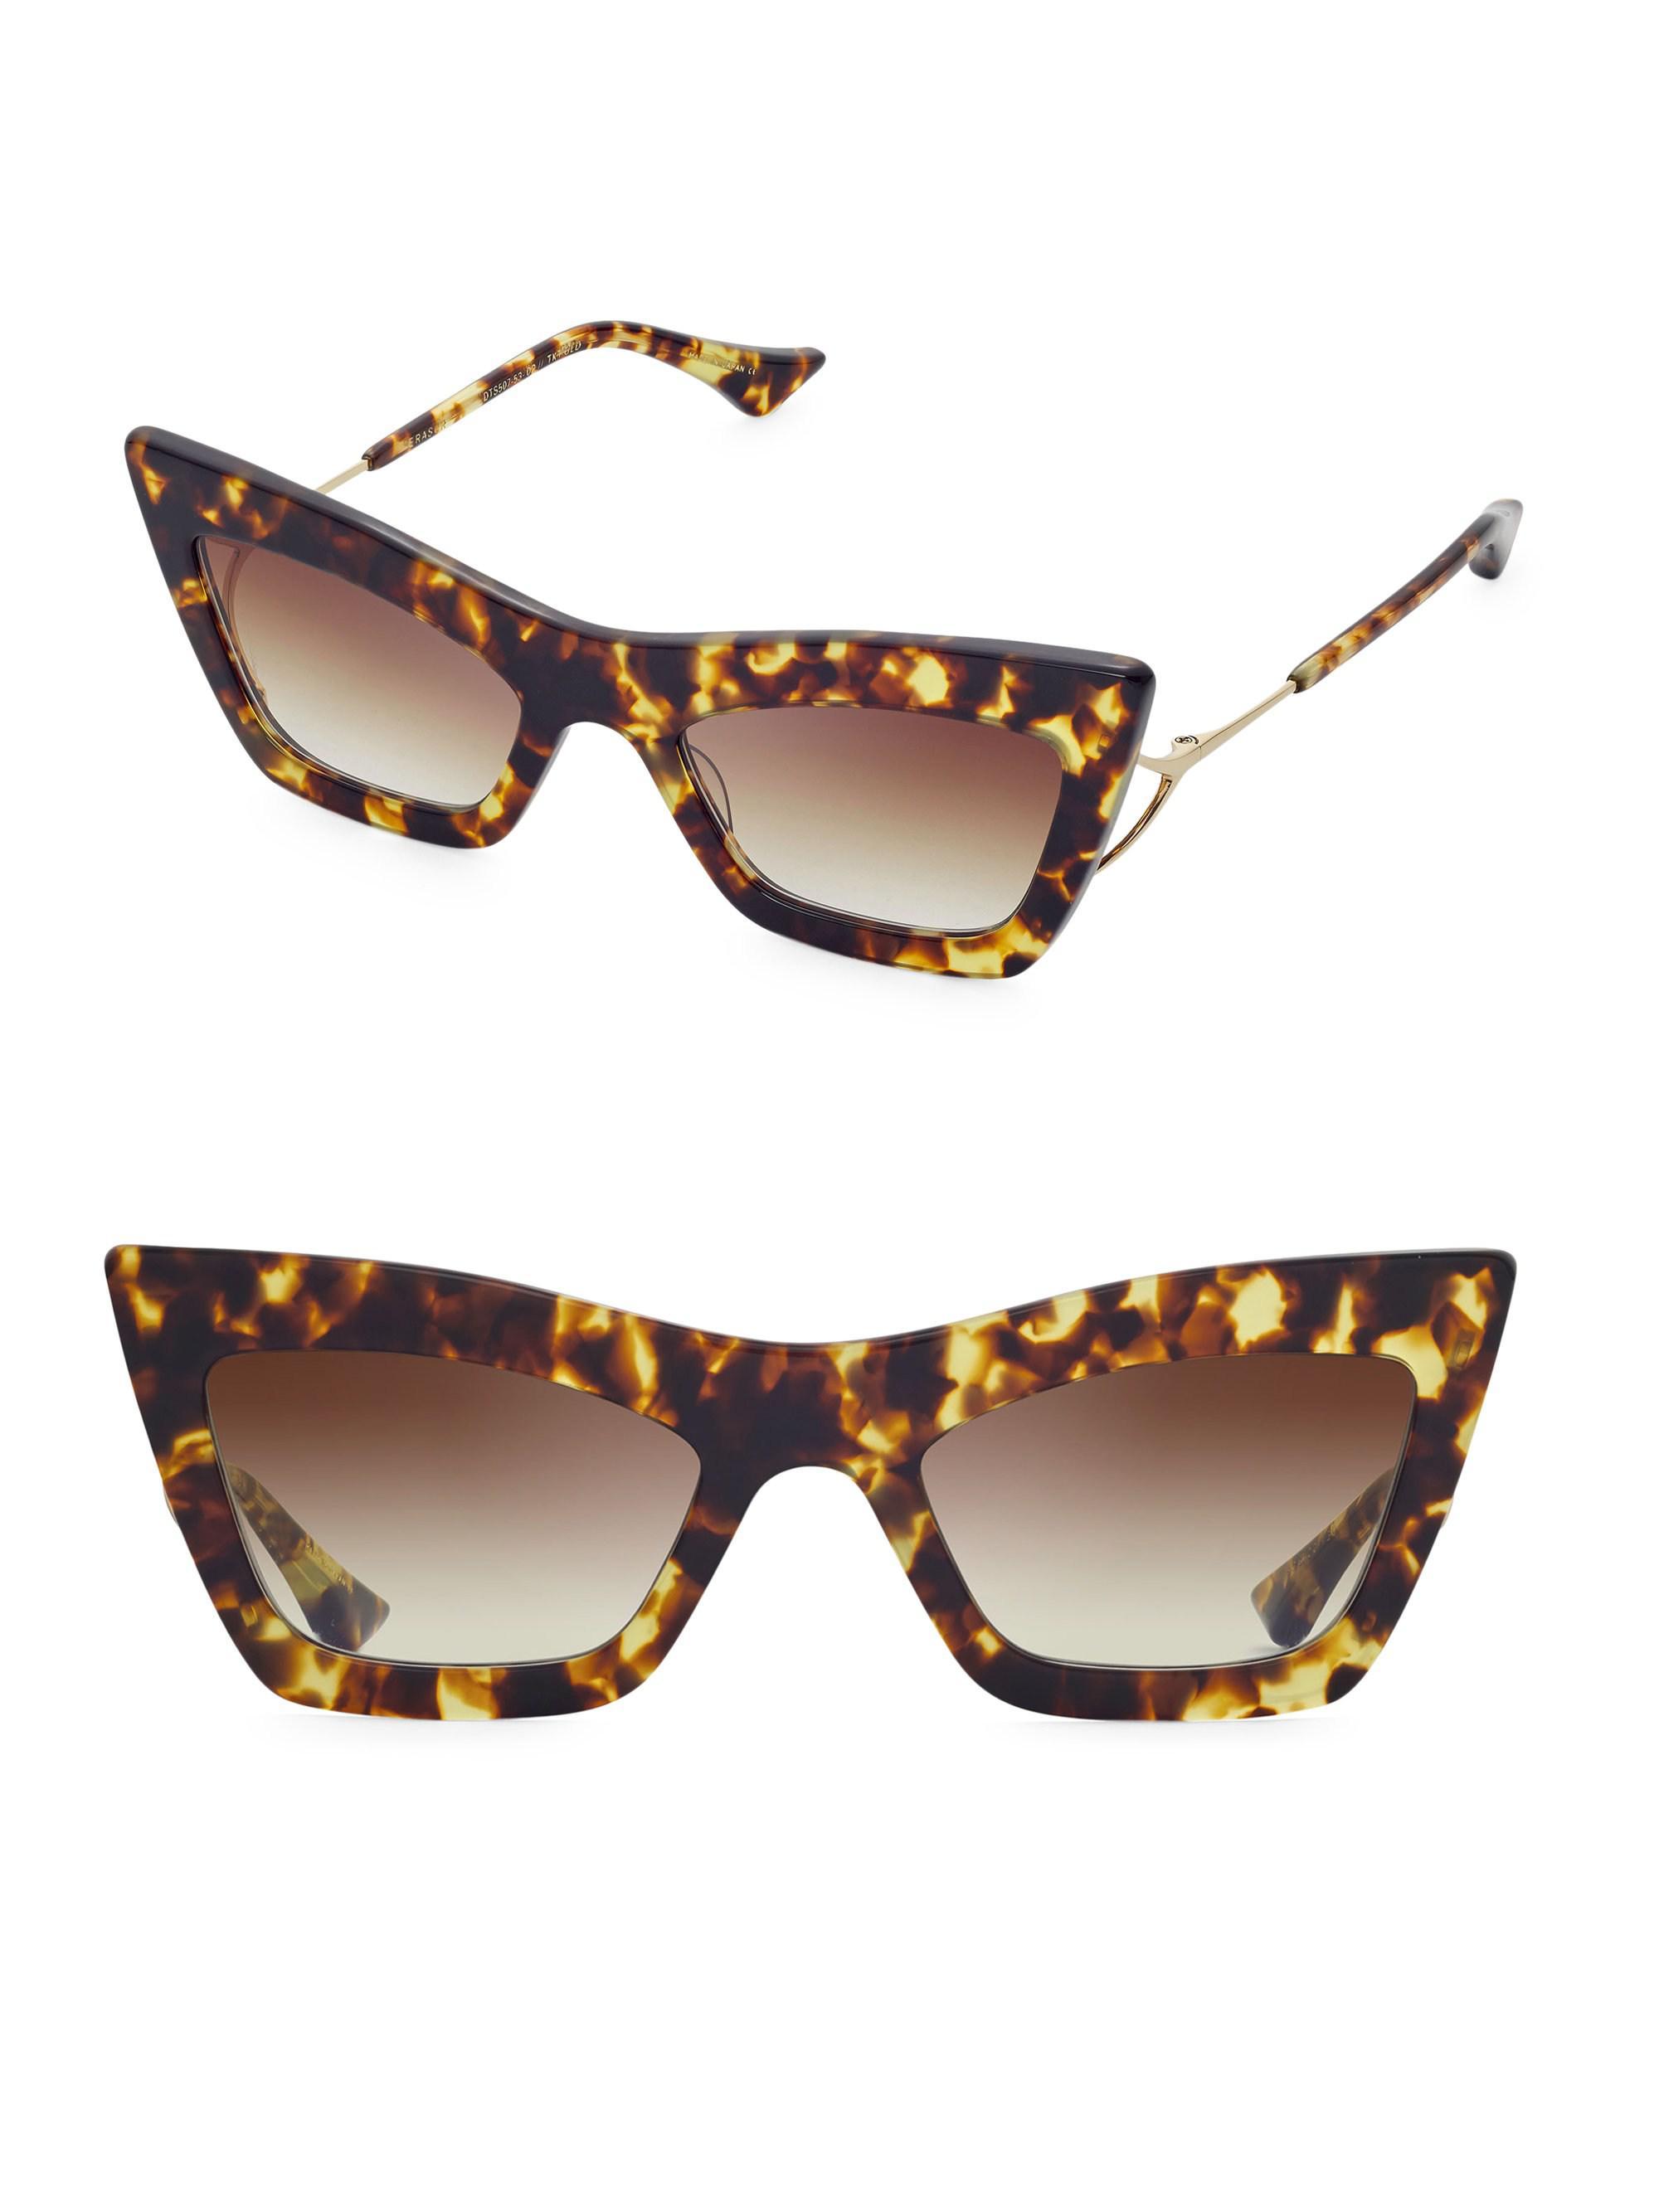 4f6d844fde45 Dita Eyewear 53mm Erasur Cat-eye Sunglasses in Brown - Lyst